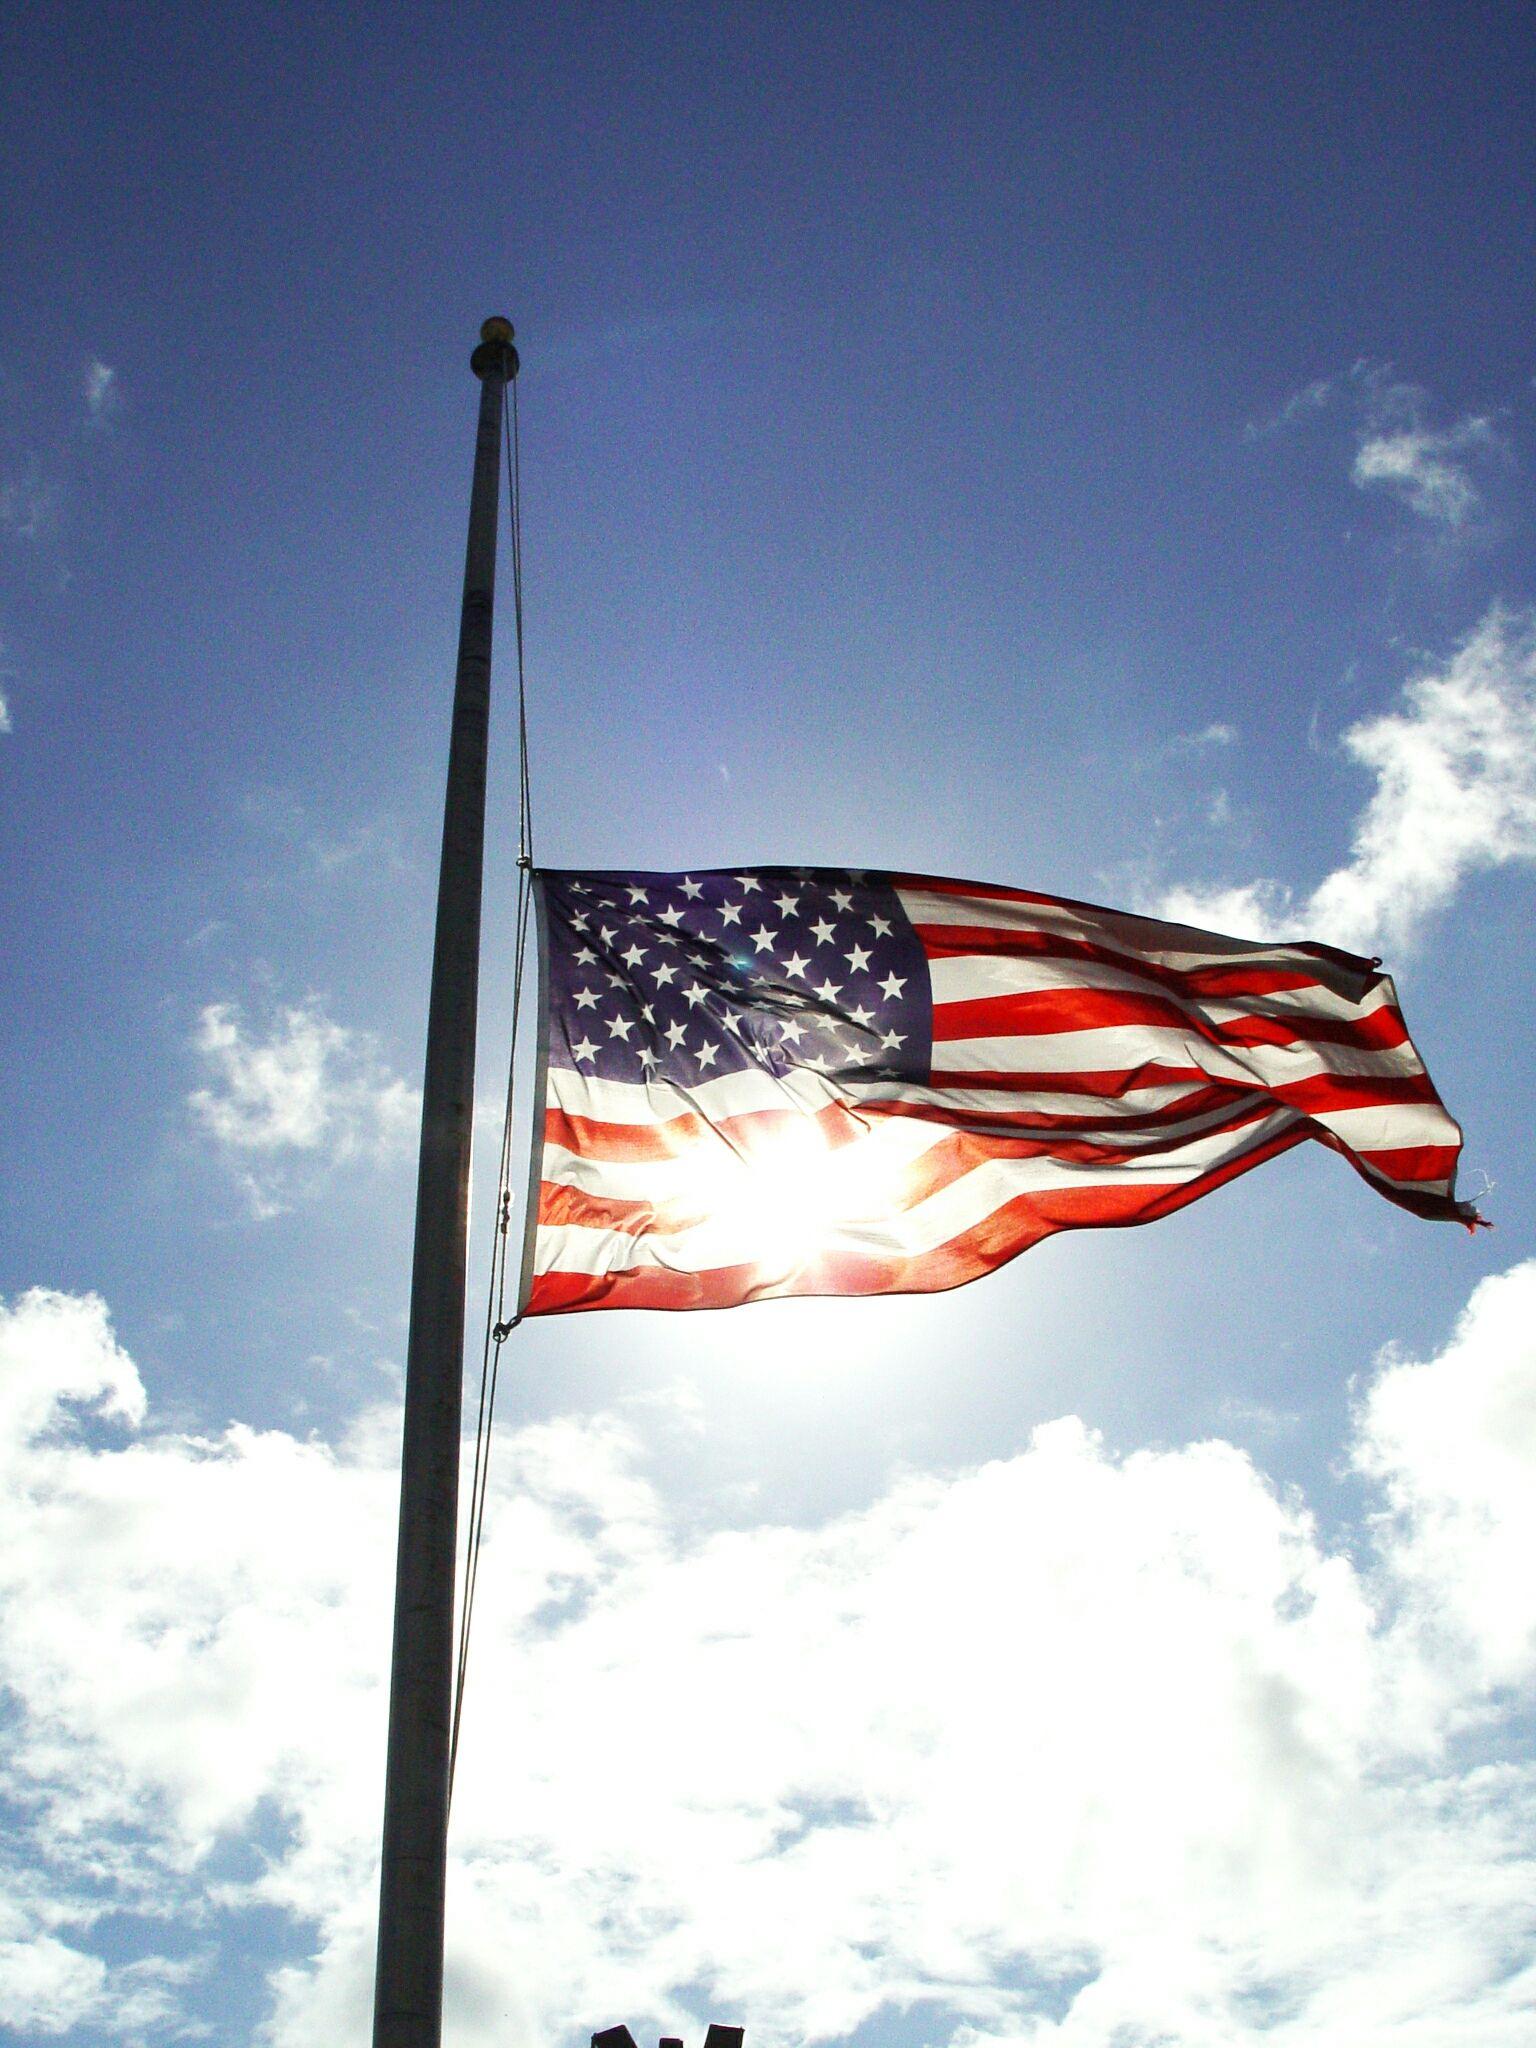 Enjoy Your Day American Flag Etiquette Flag Display American Flag